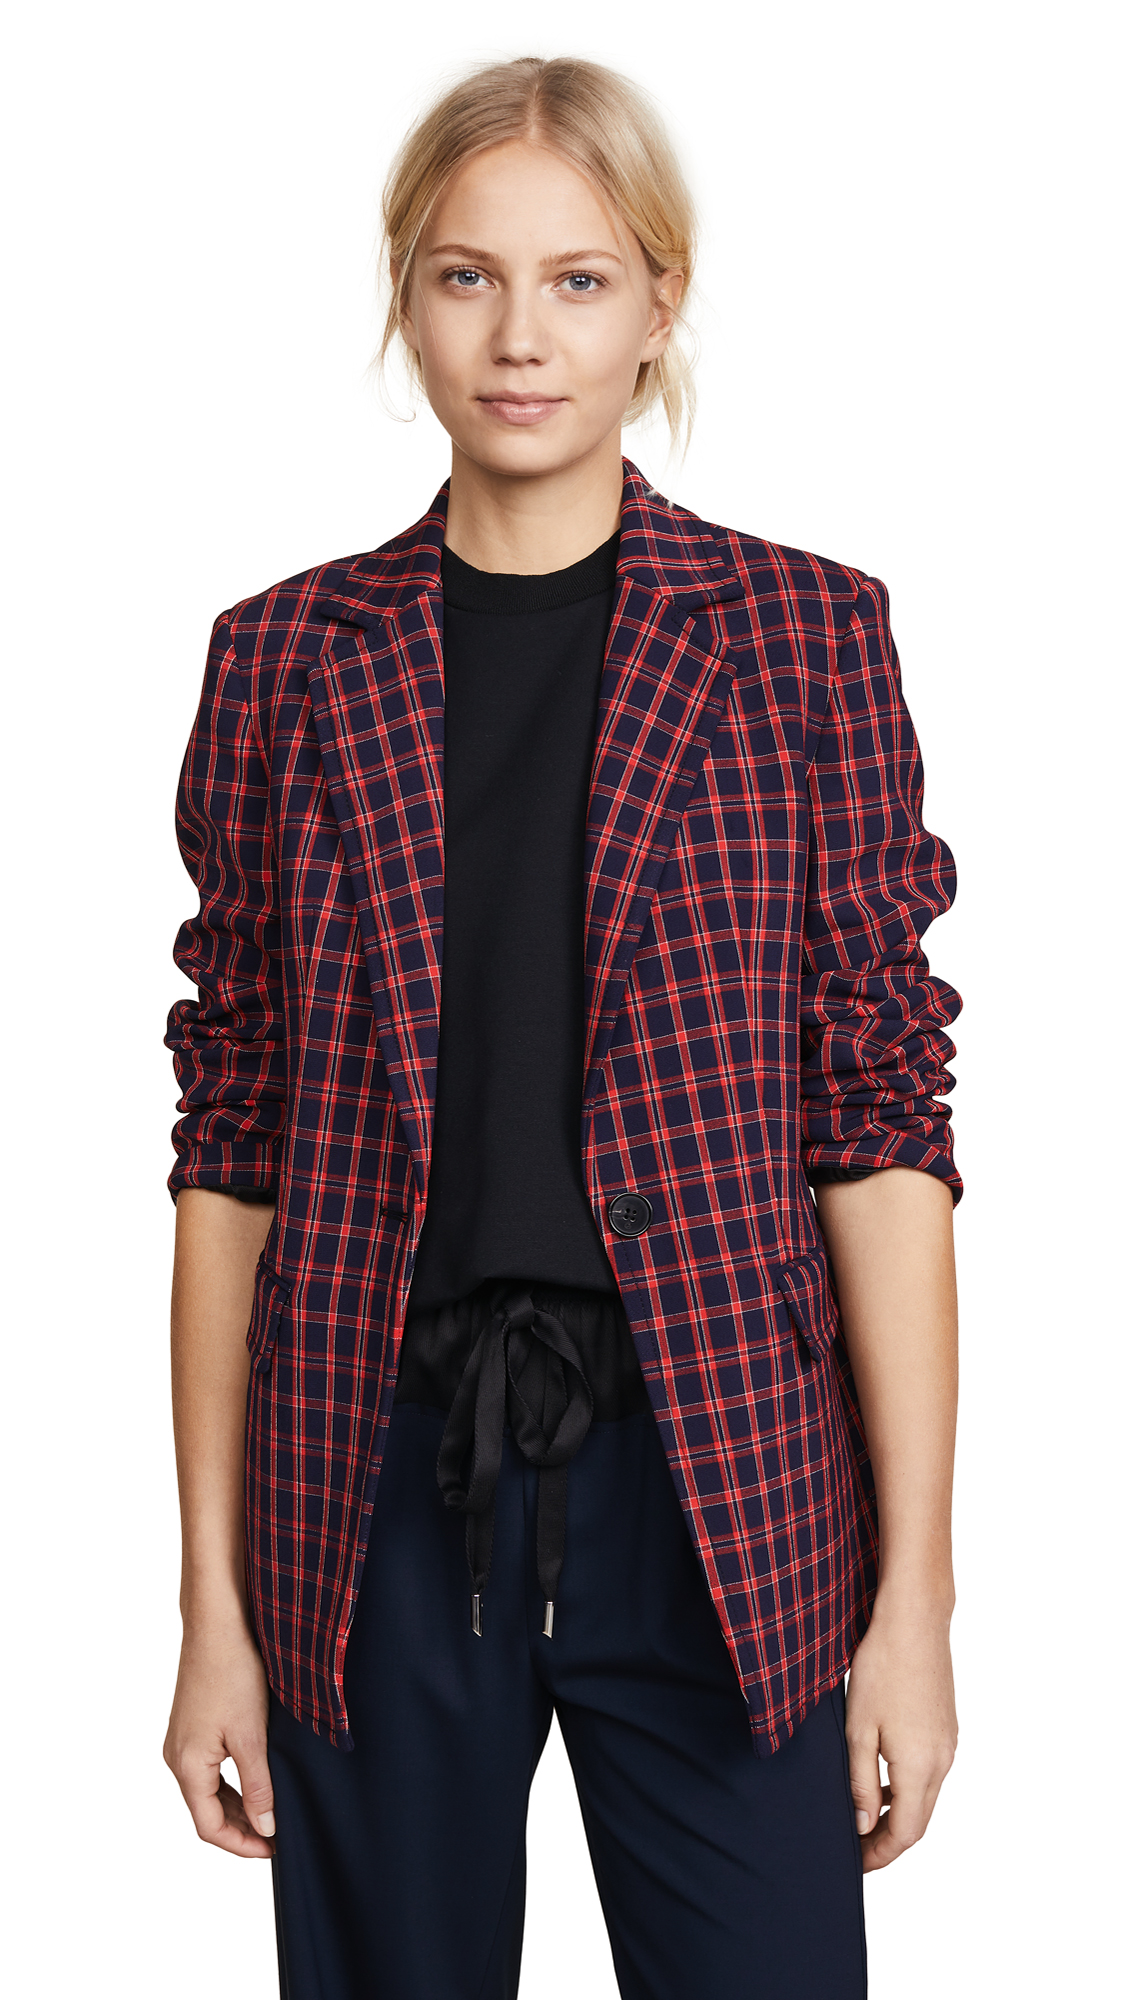 3.1 Phillip Lim Plaid Single Button Blazer - Black/Red